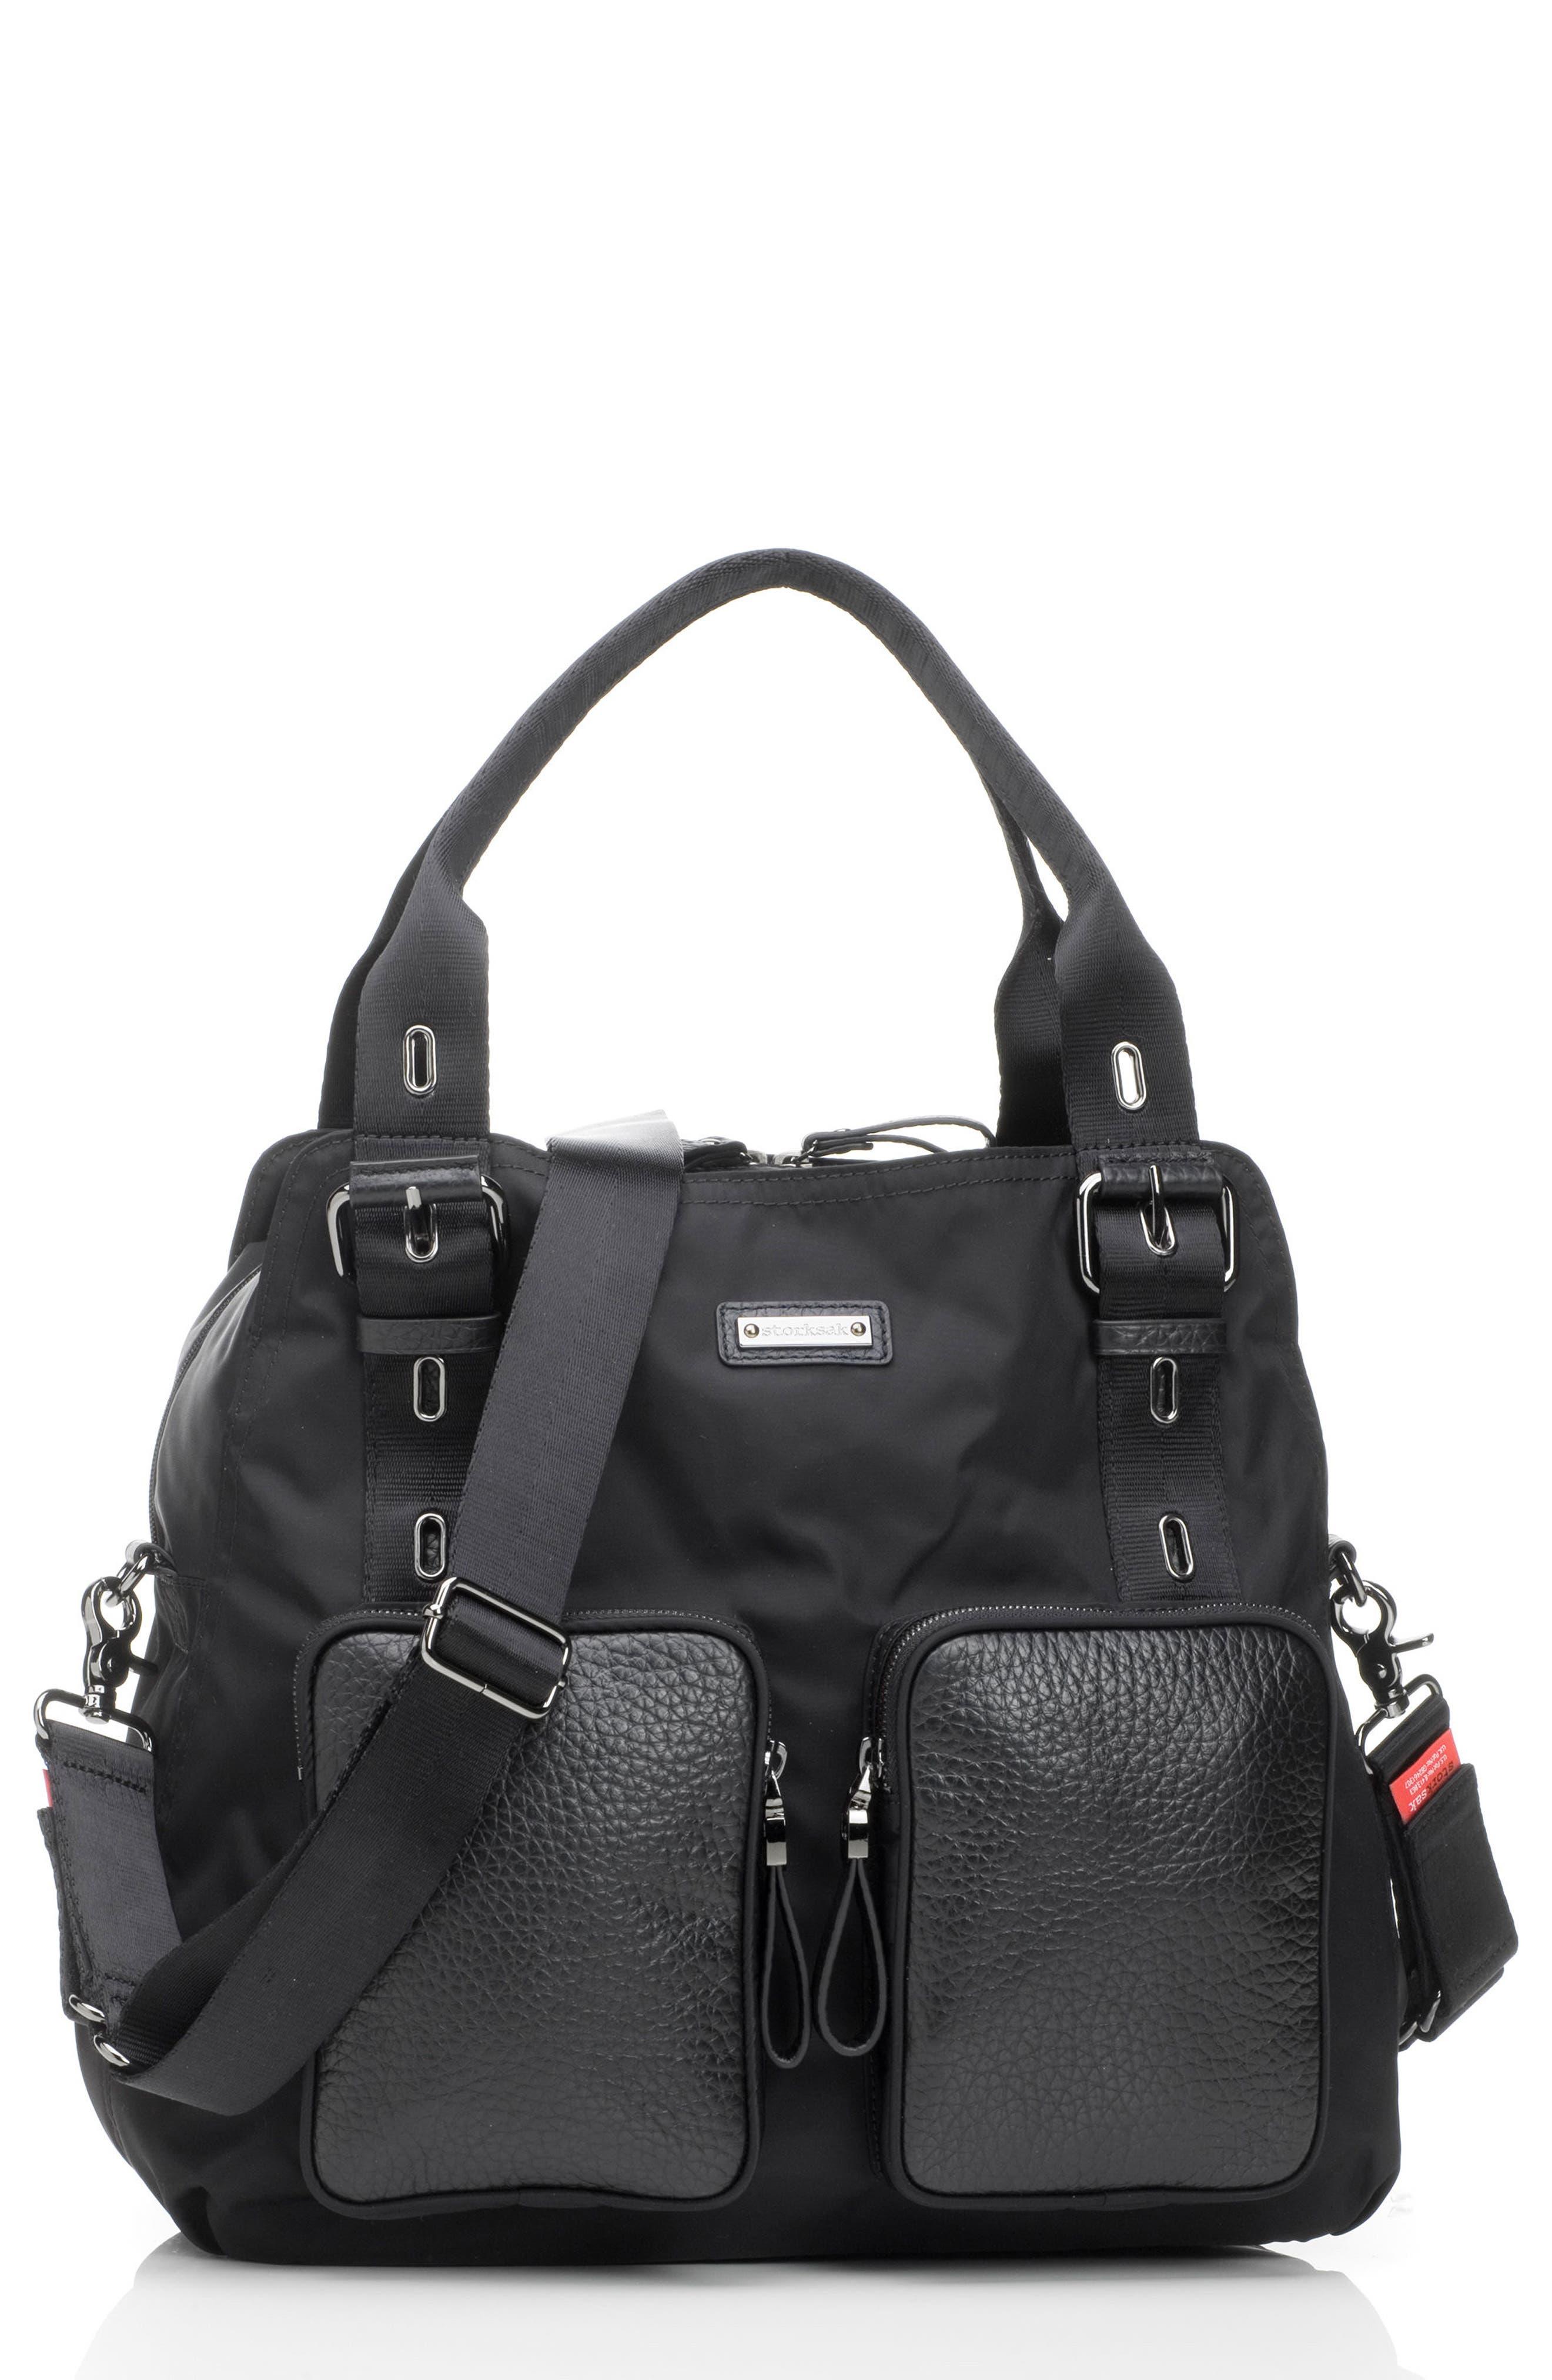 Alexa Luxe Diaper Bag,                             Main thumbnail 1, color,                             BLACK